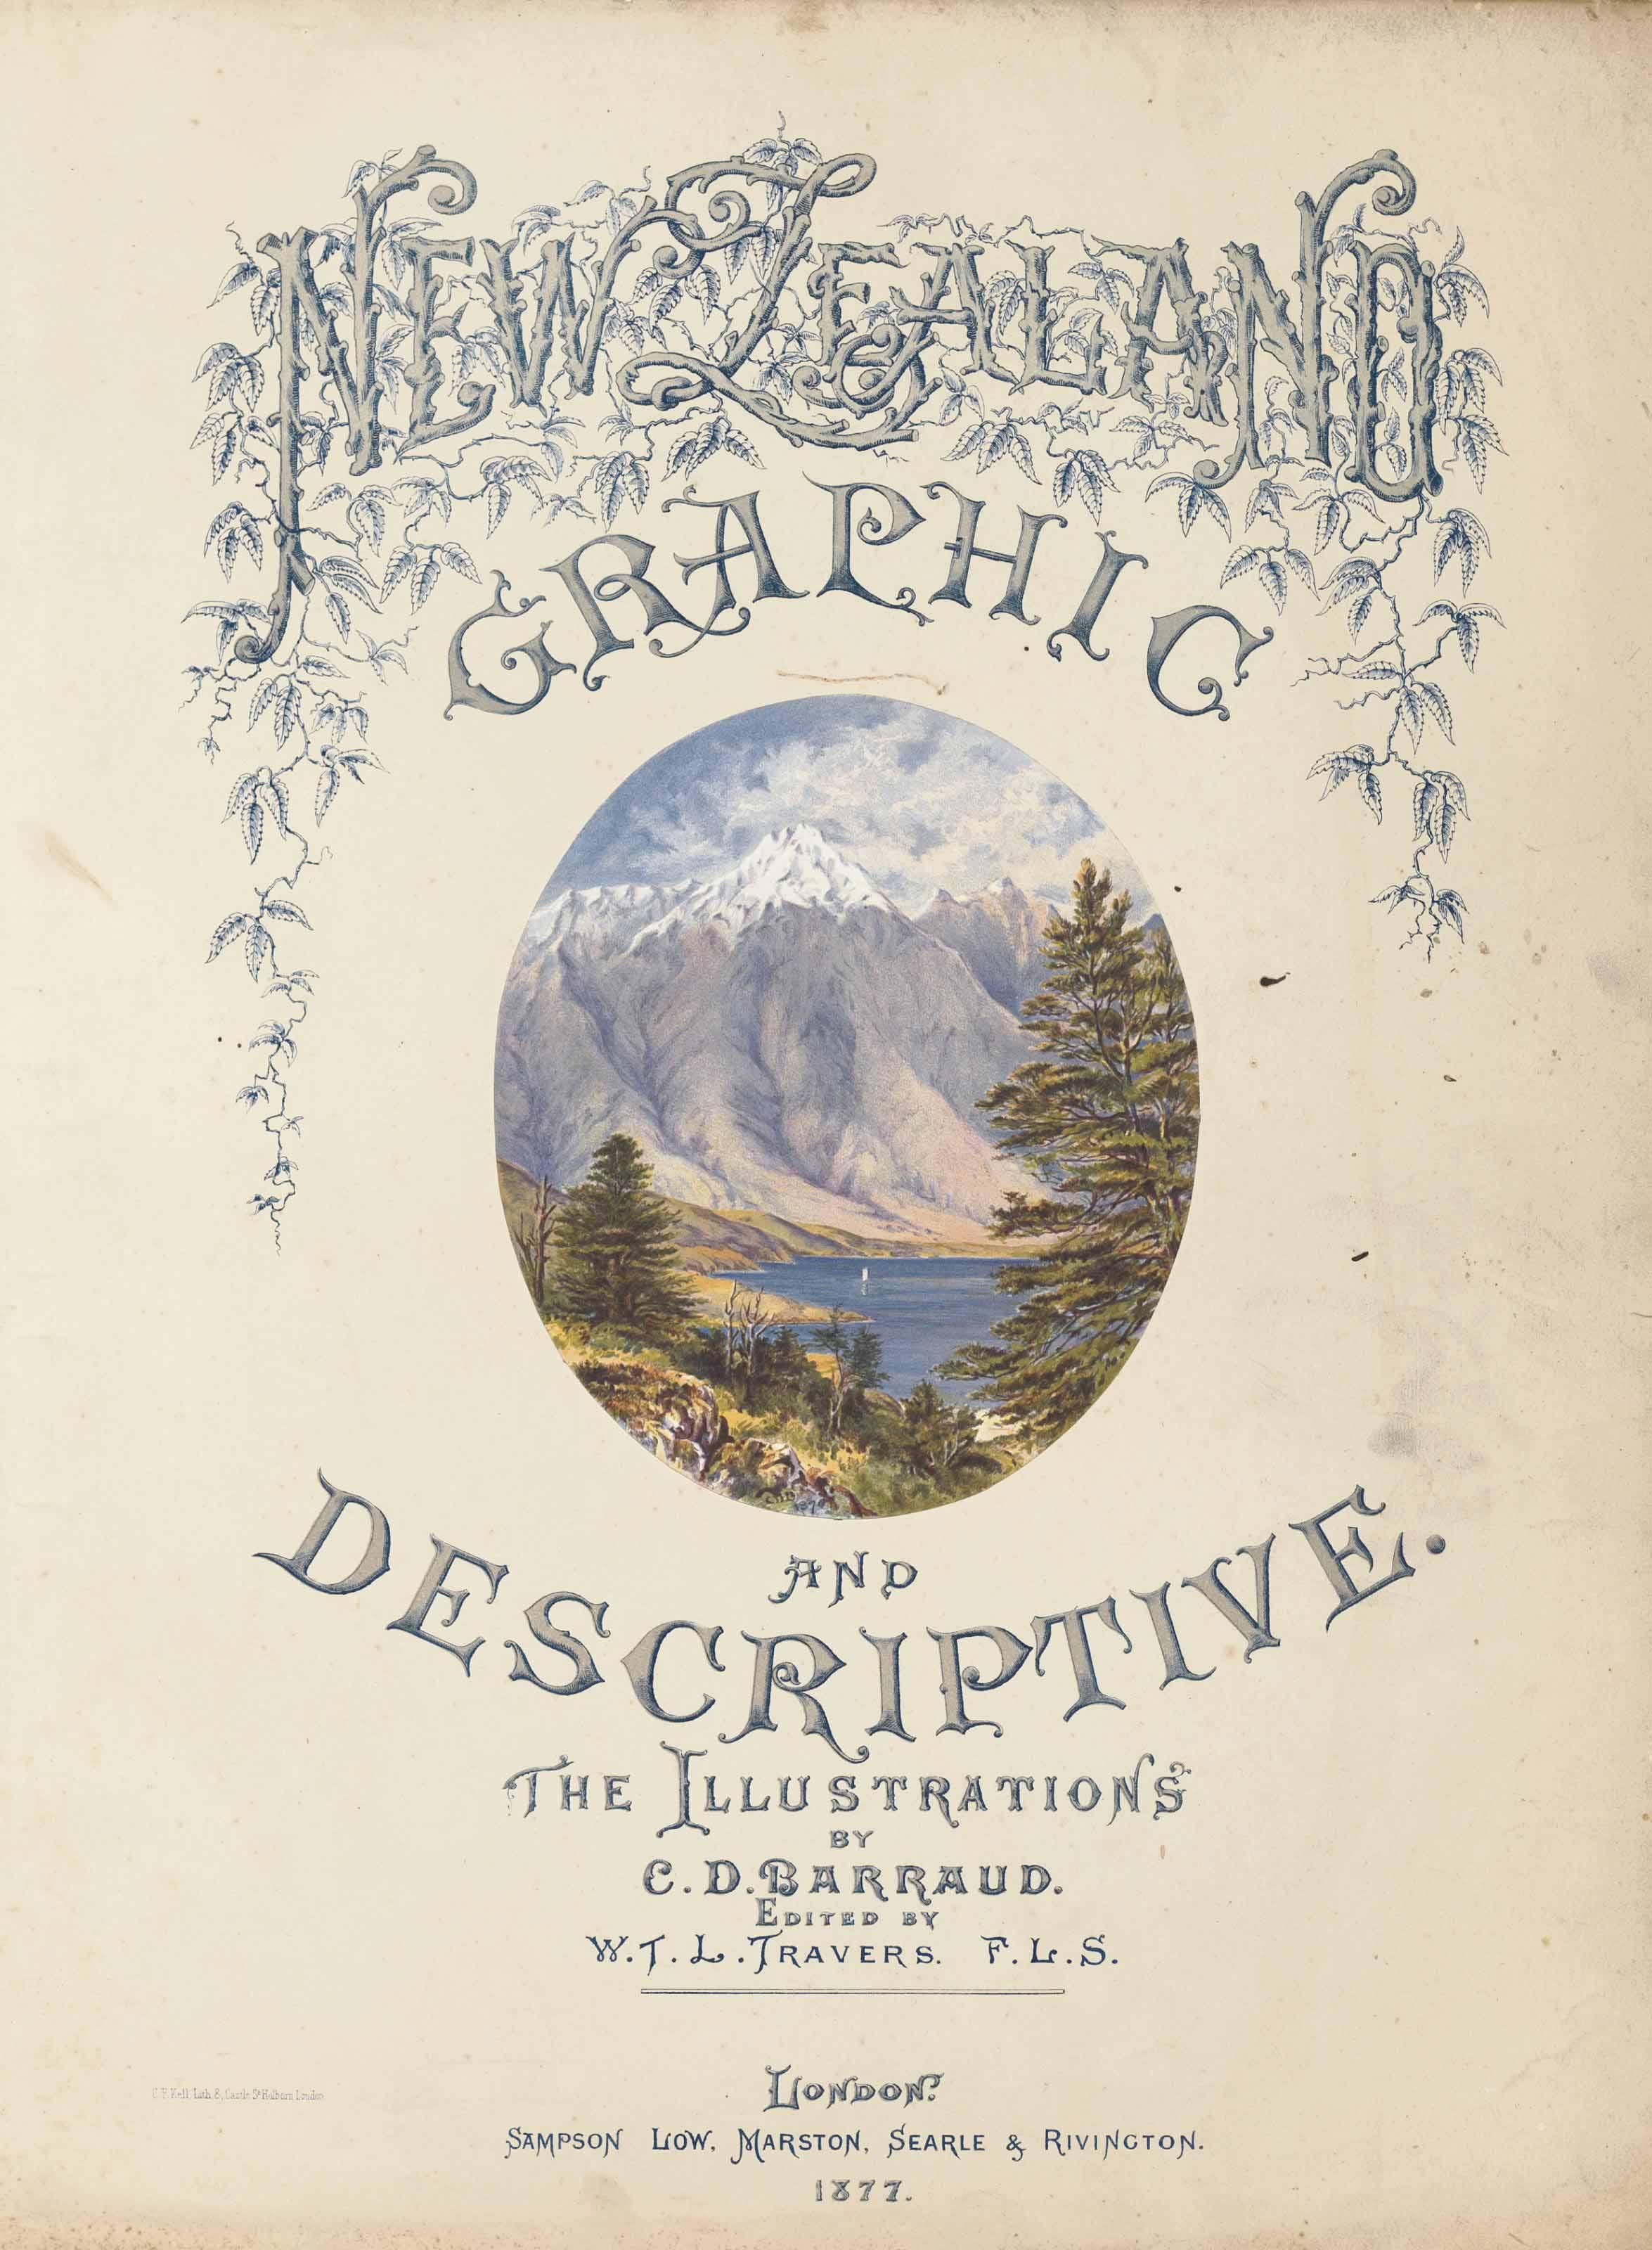 CHARLES DECIMUS BARRAUD AND WILLIAM T.L. TRAVERS